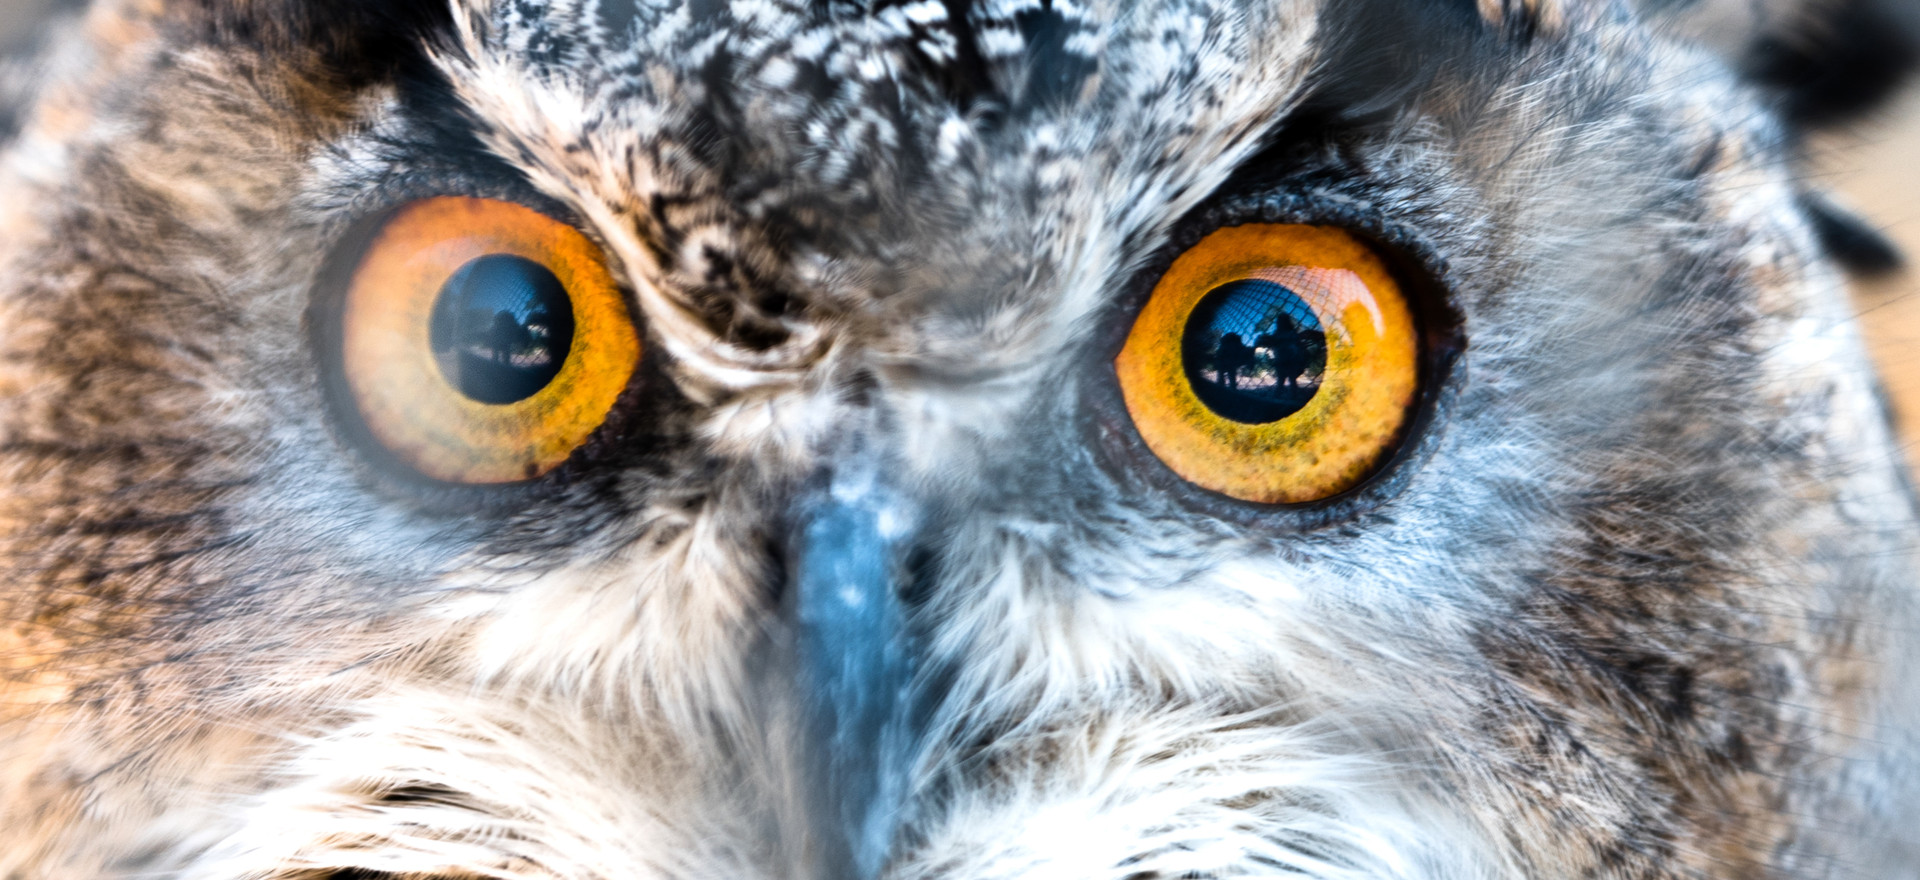 I've Got My Eyes On You